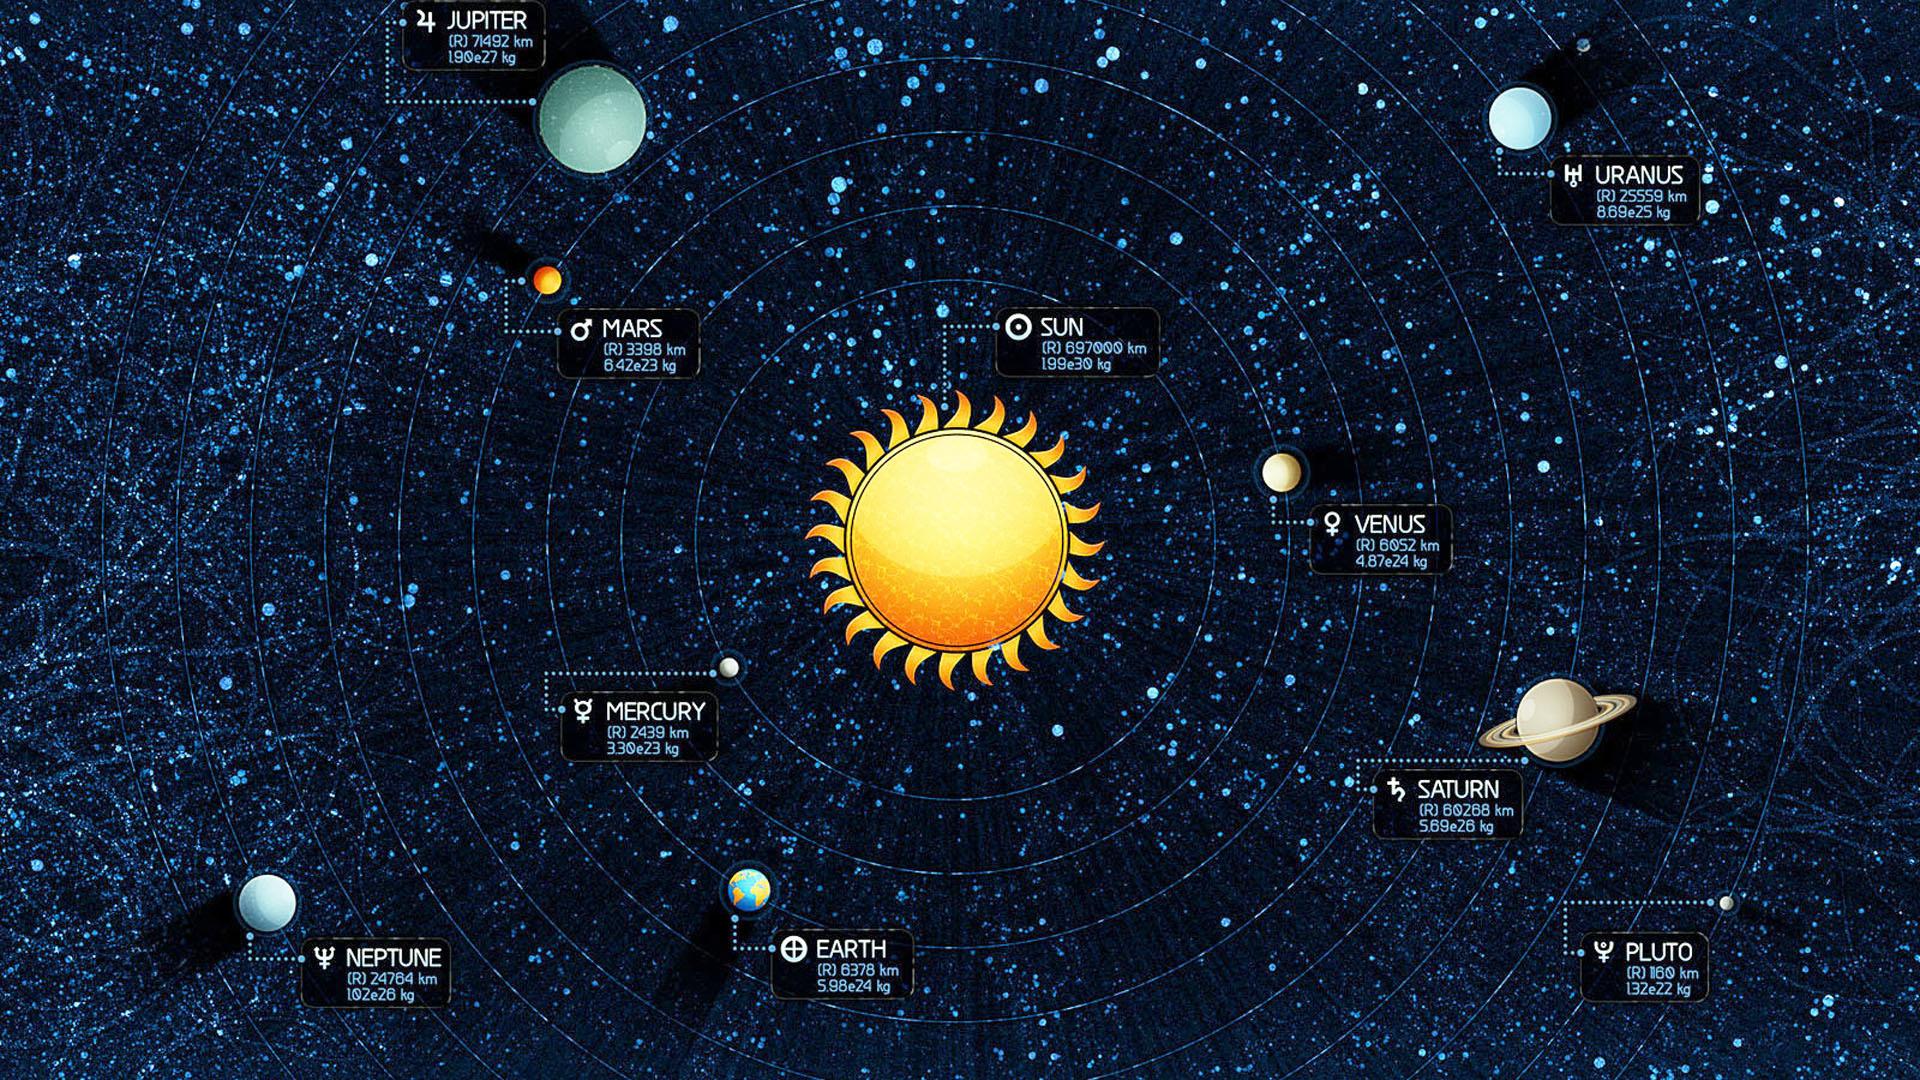 Solar System Wallpapers For Desktop